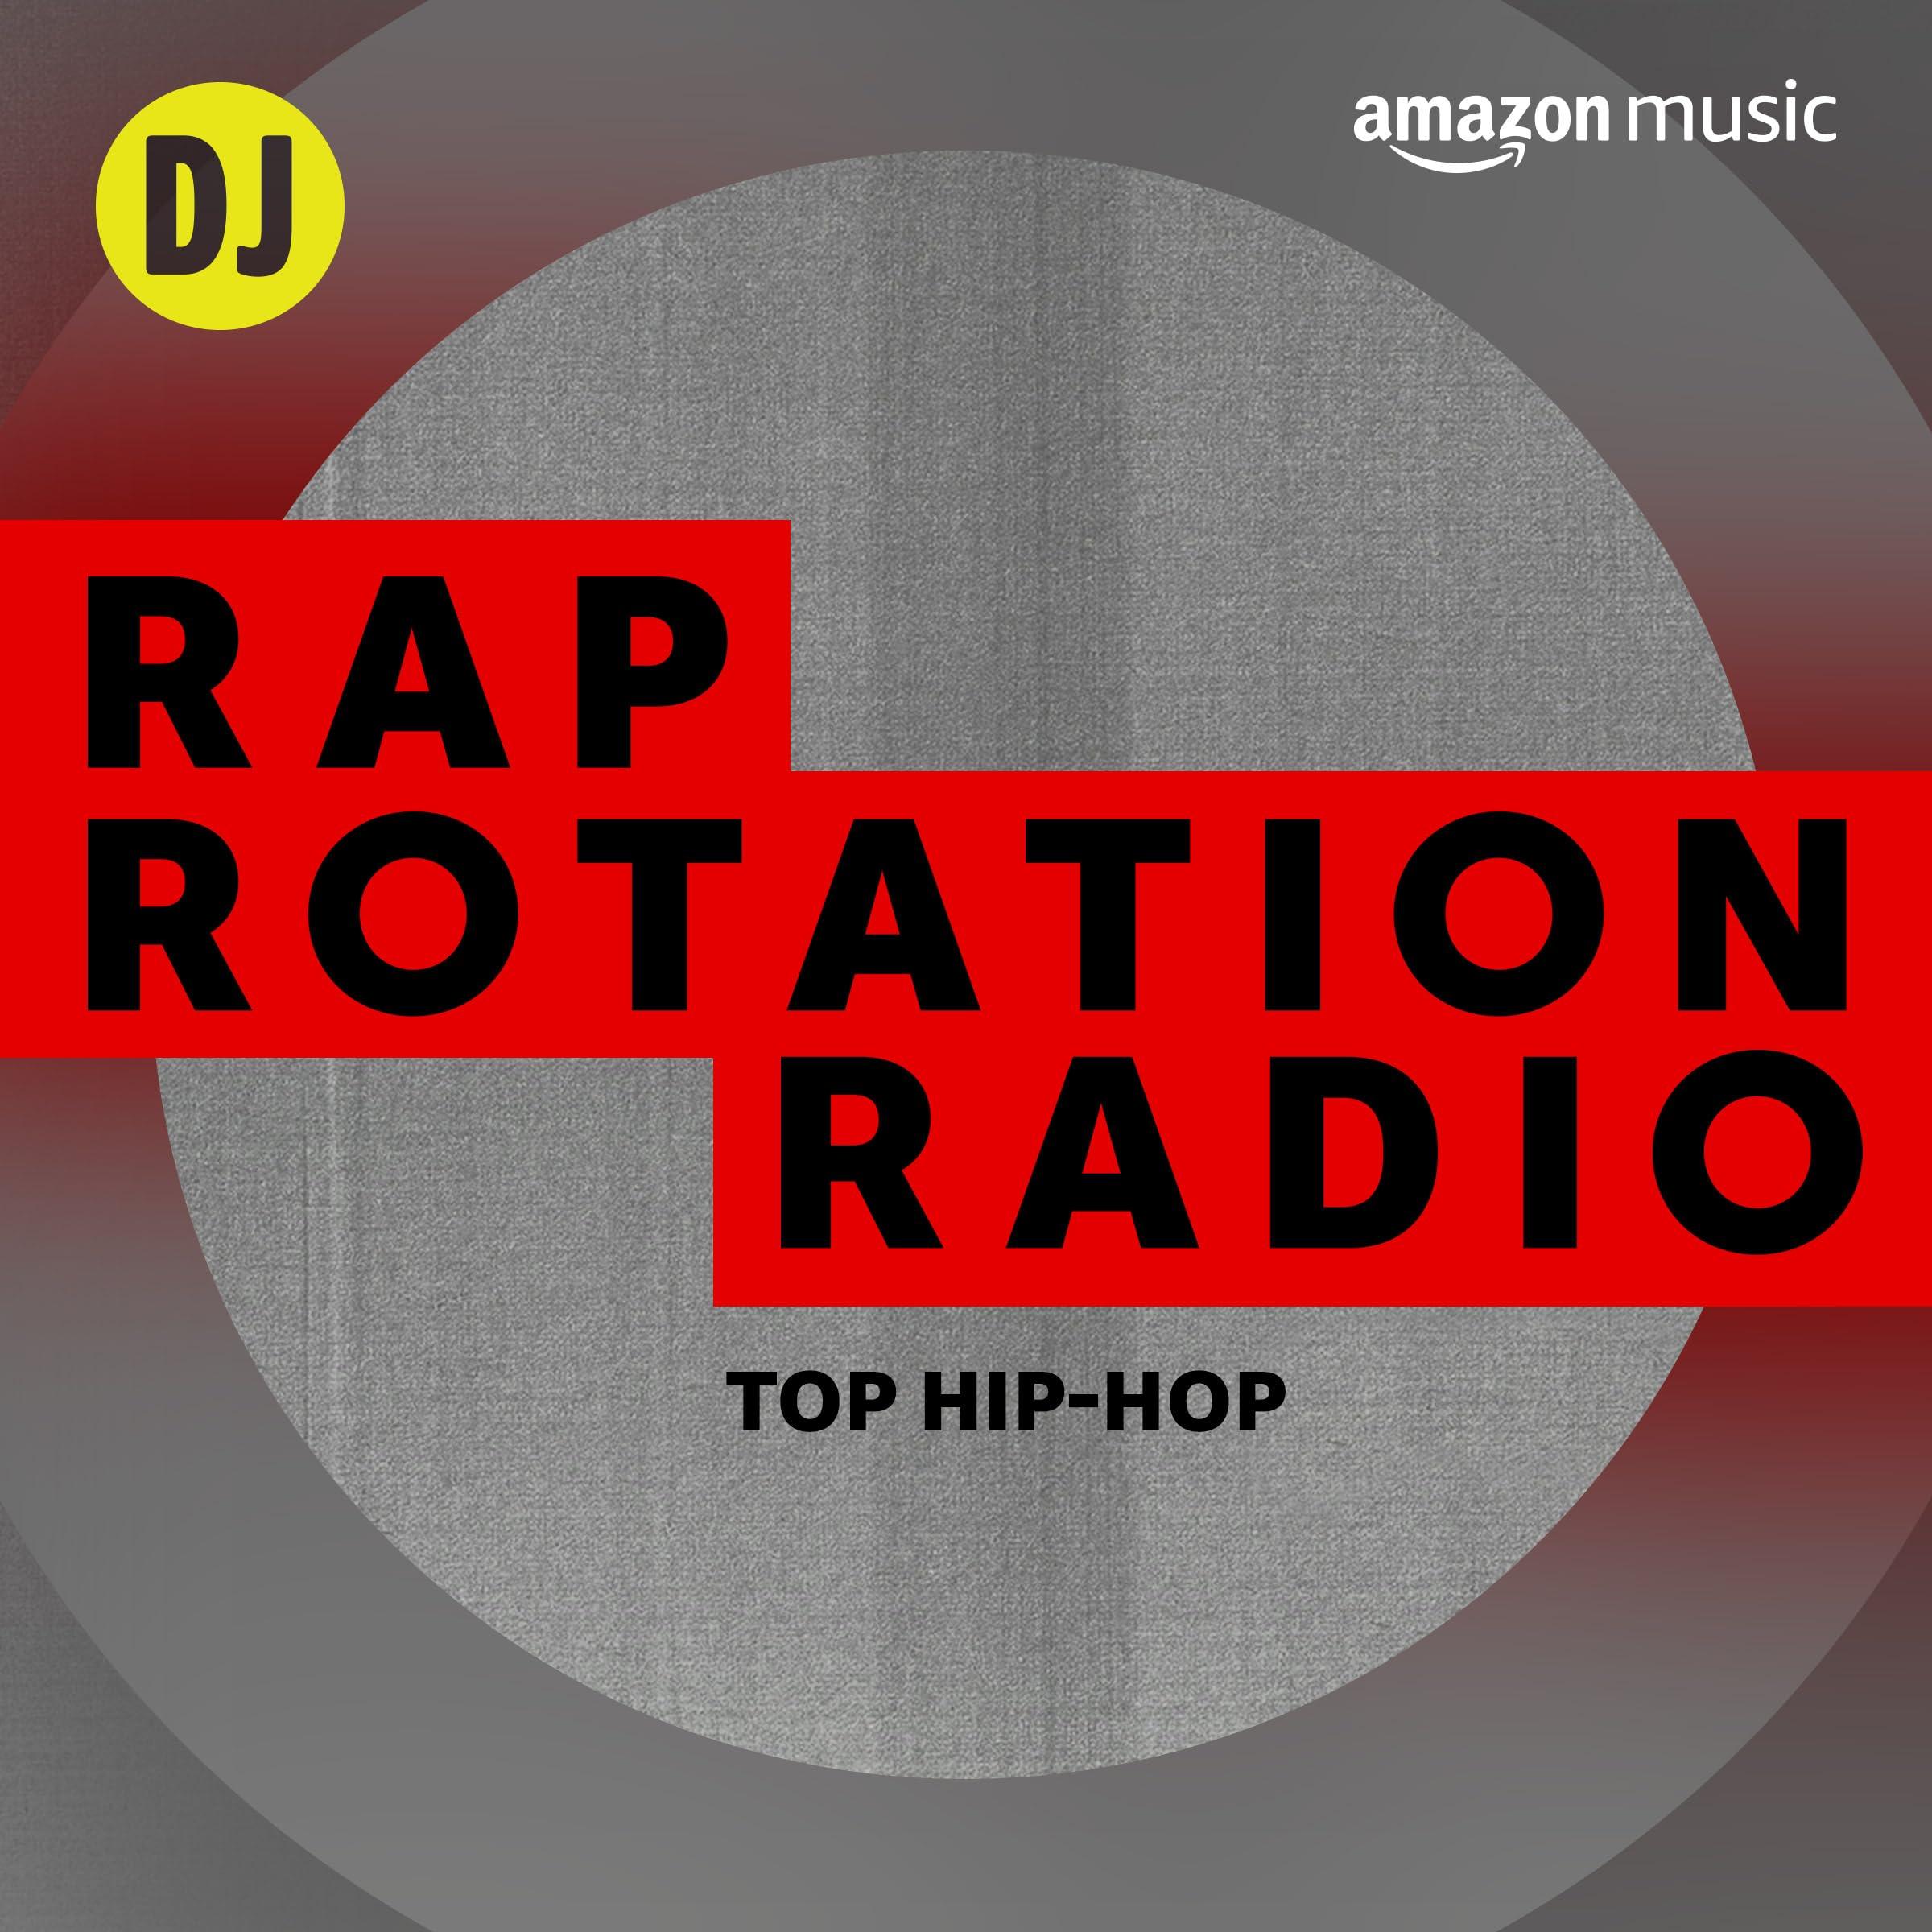 Rap Rotation in DJ Mode